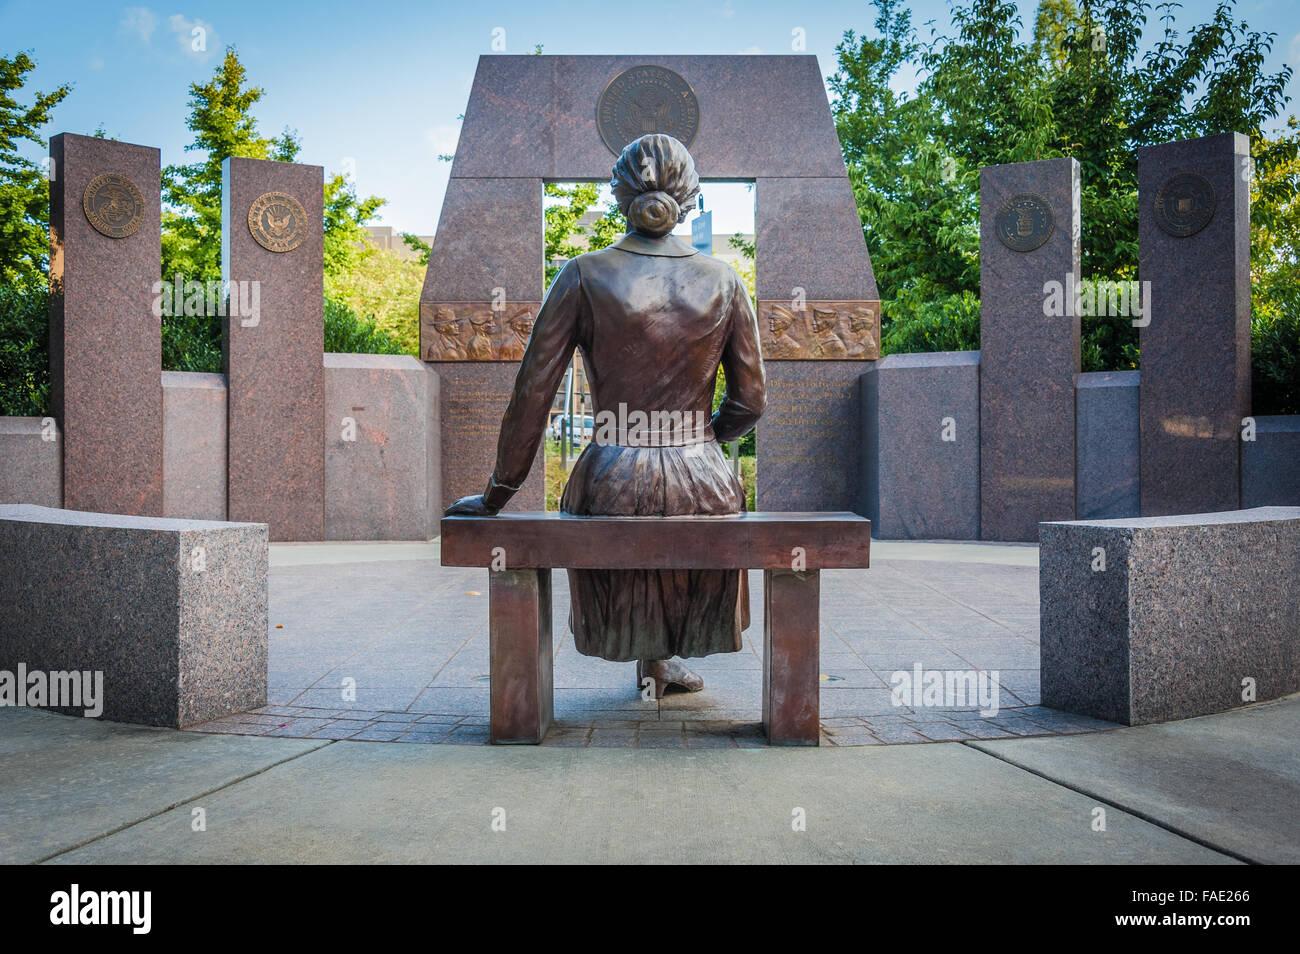 Western North Carolina Veterans Memorial at Pack Place Park in downtown Asheville, North Carolina, USA. - Stock Image